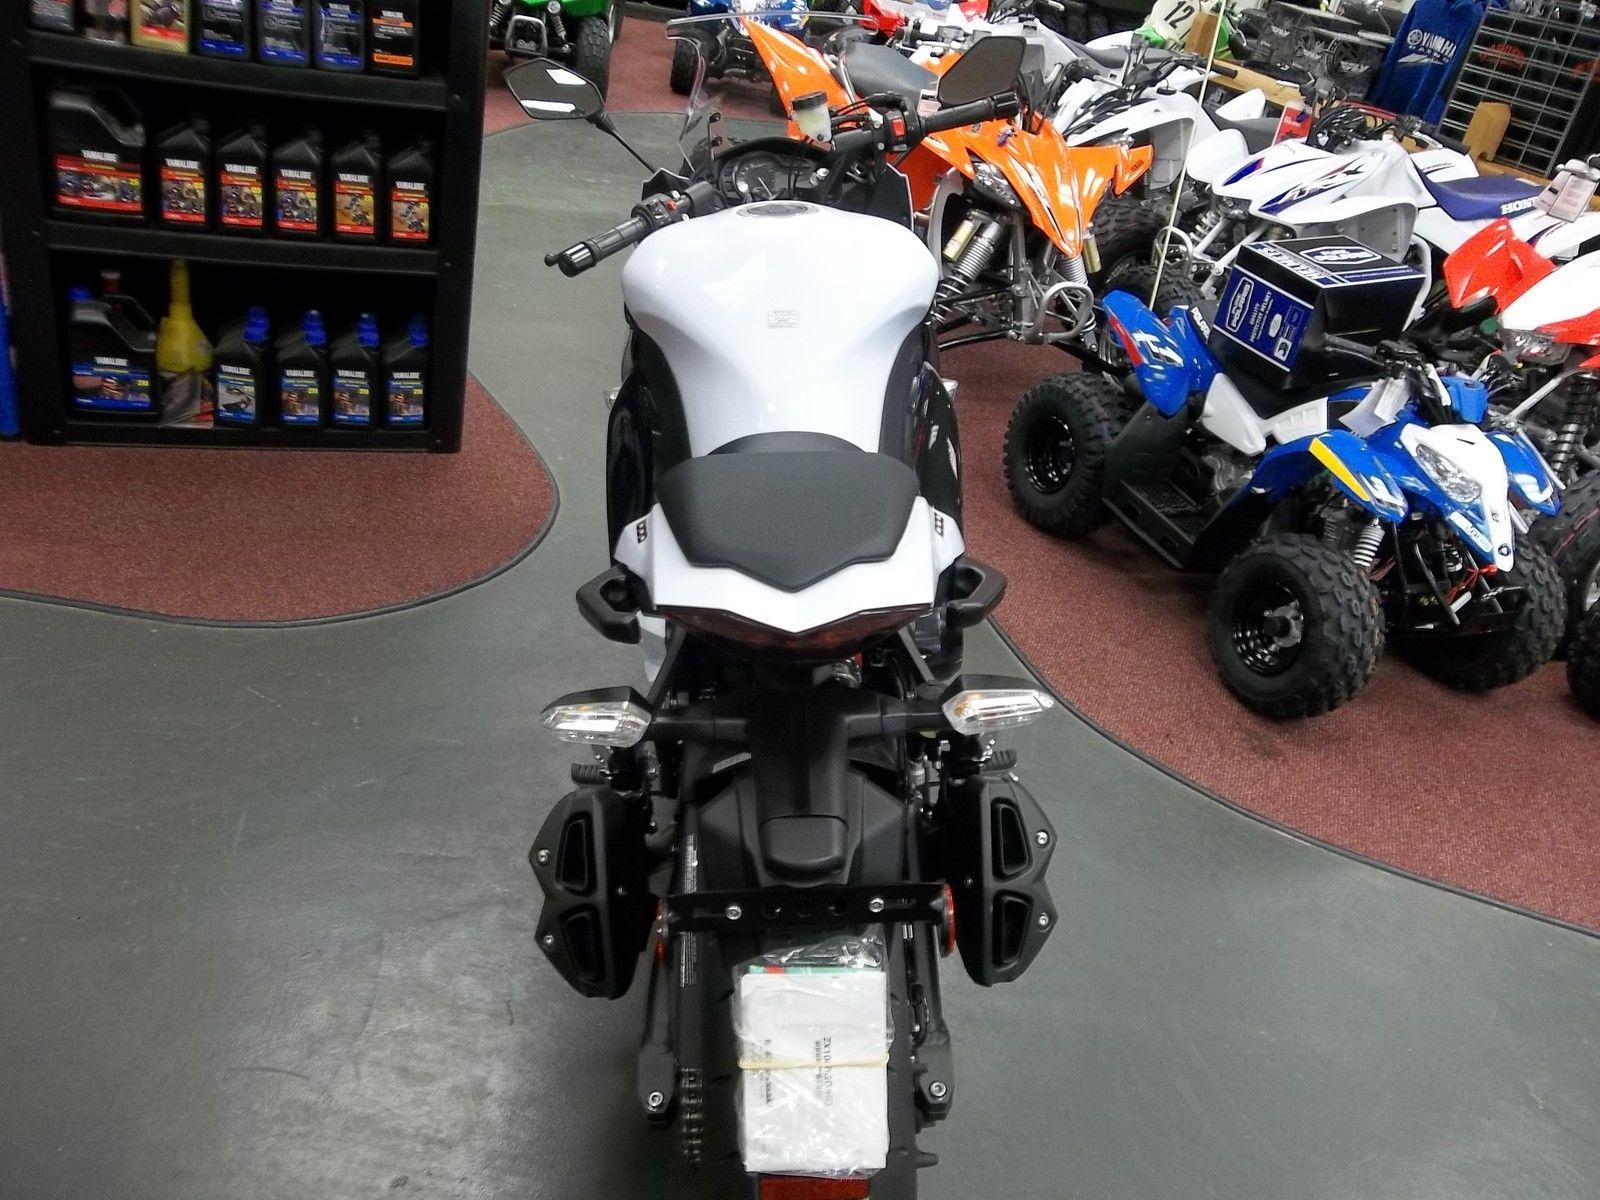 2013 Kawasaki Ninja 1000 Abs White Motorcycle Sport Bike No Fees New